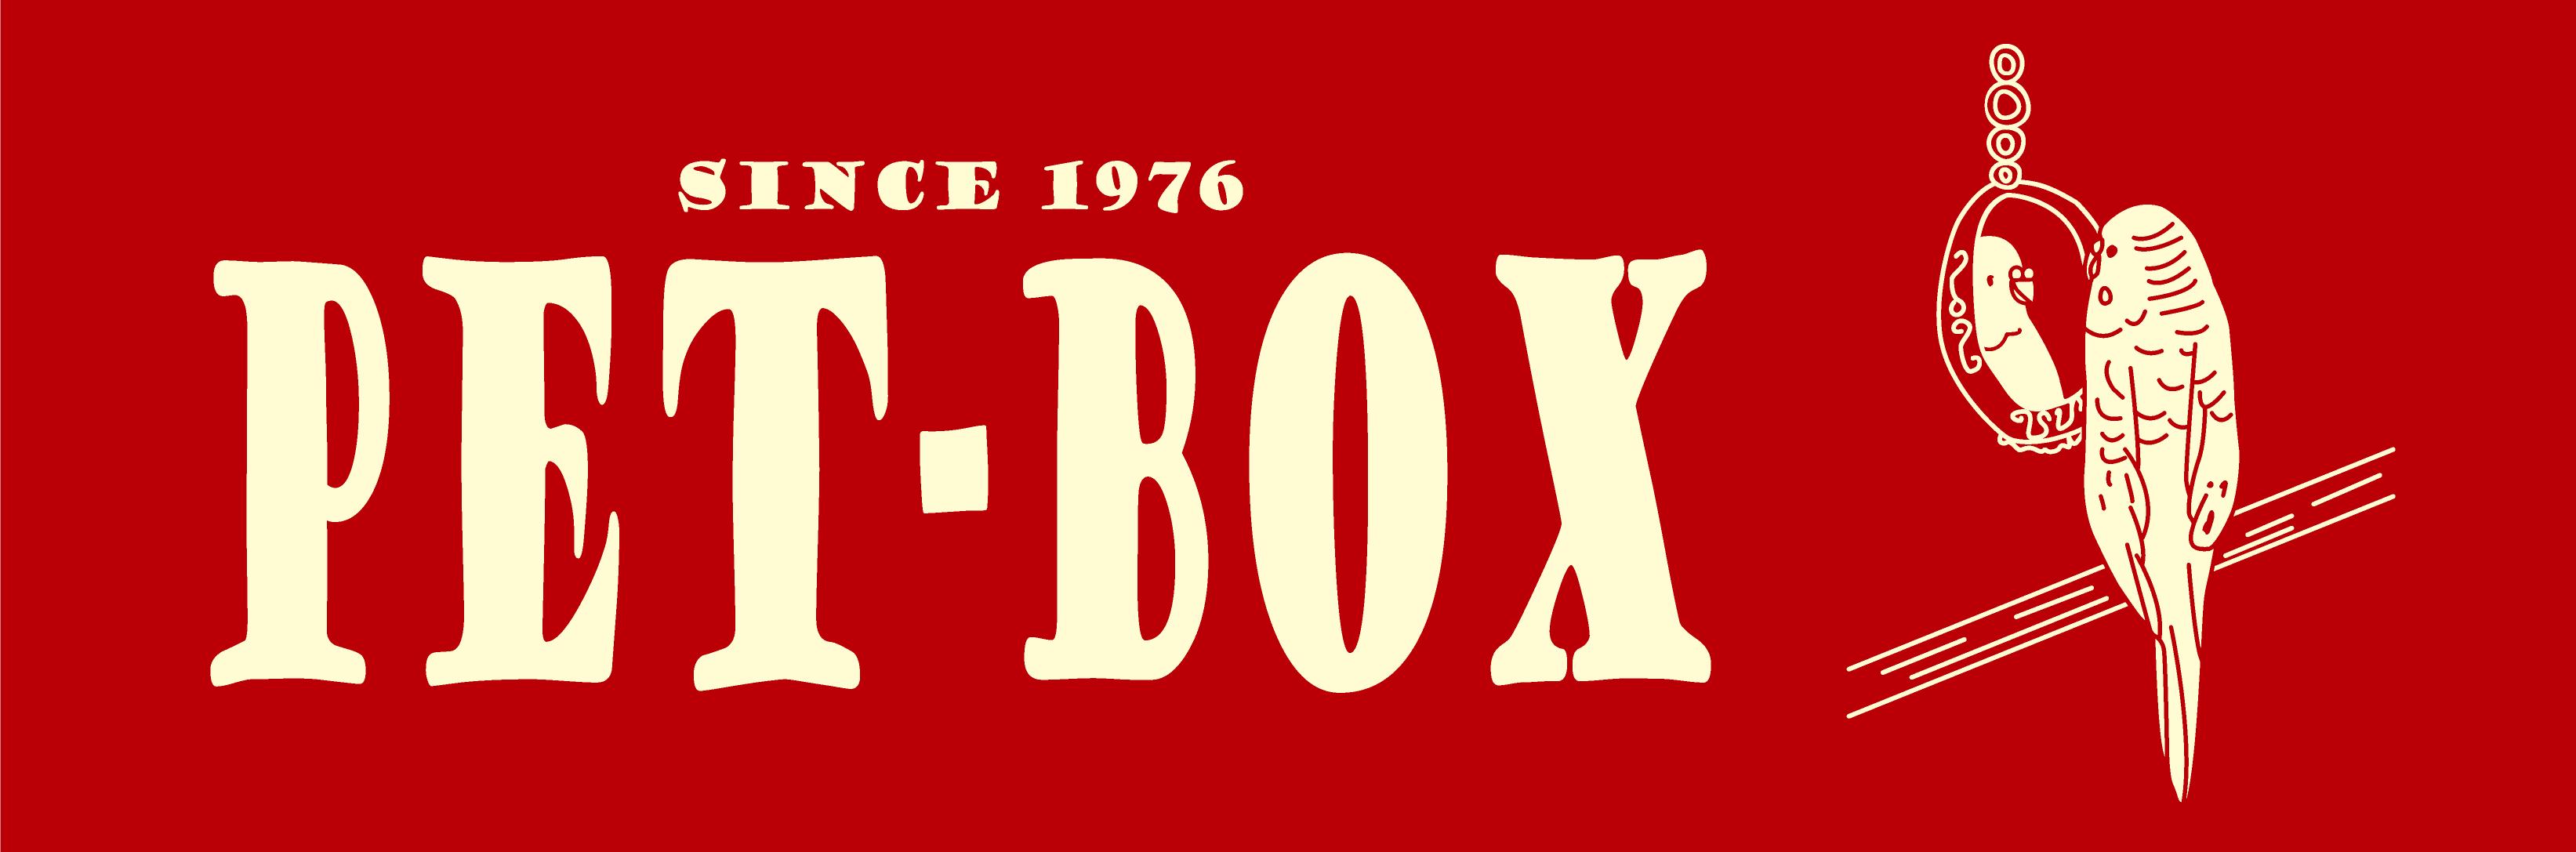 petbox1976